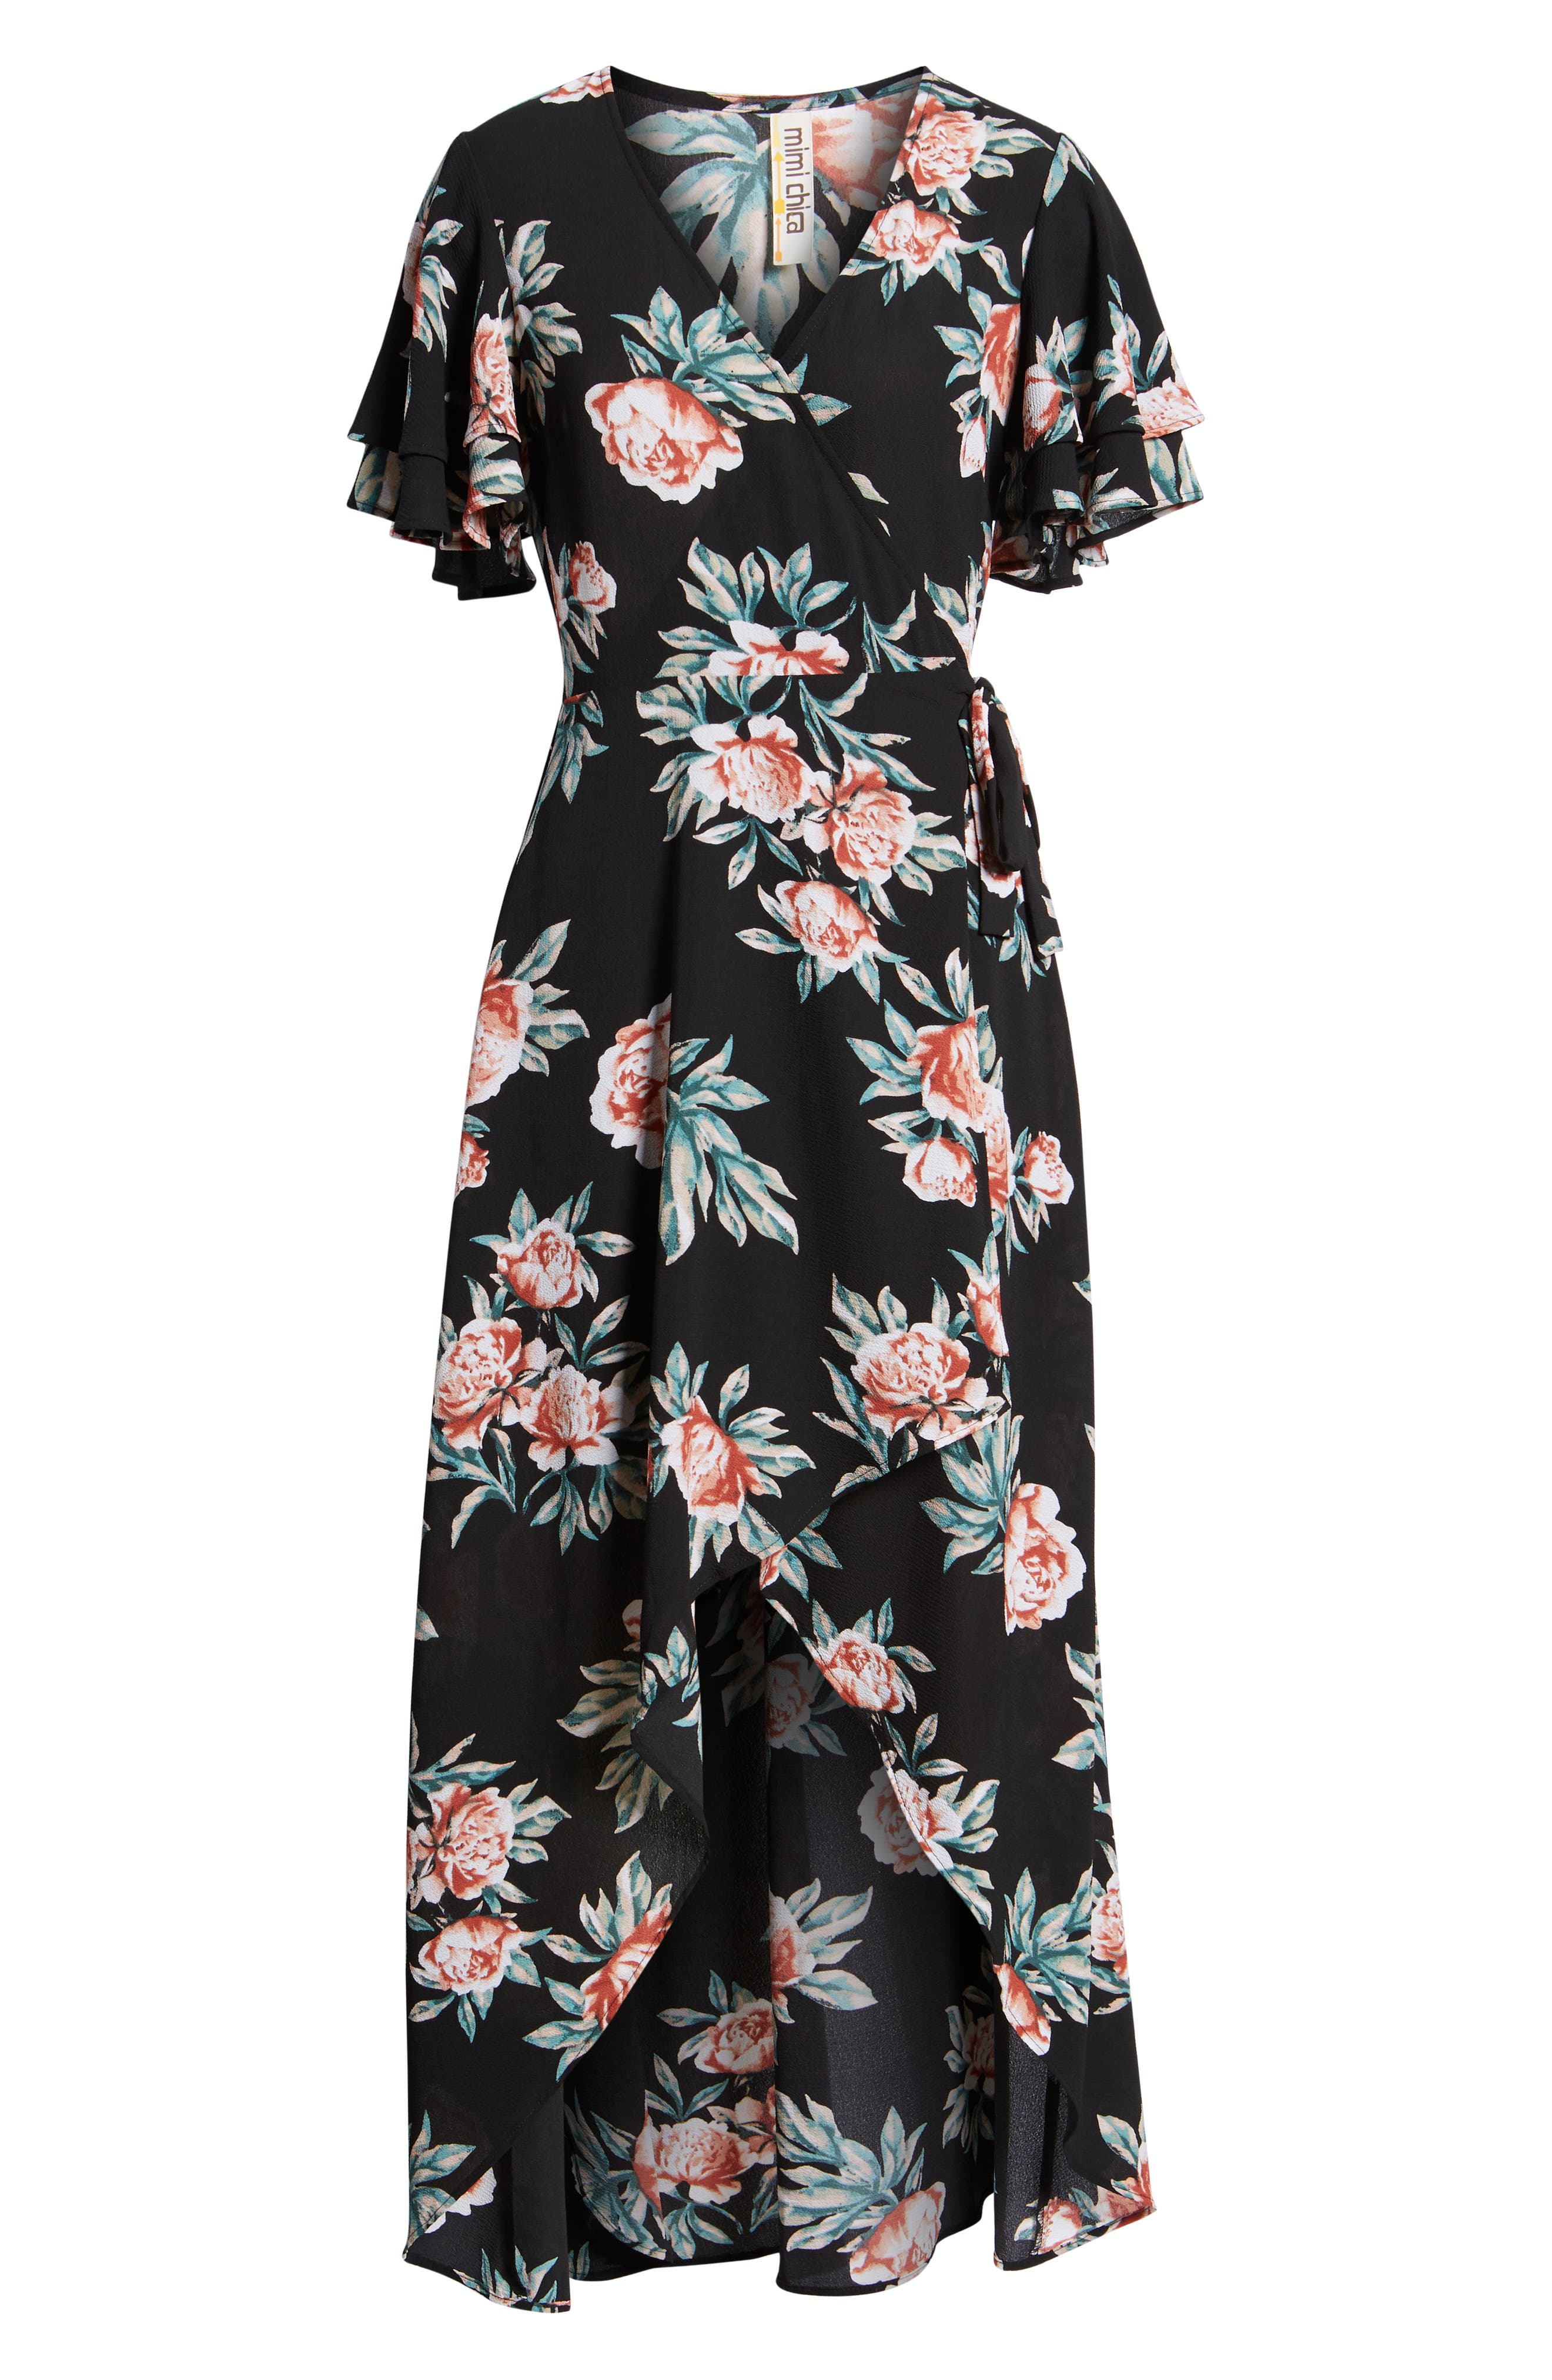 Ruffle Sleeve Floral Maxi Dress,                             Alternate thumbnail 7, color,                             Black Floral